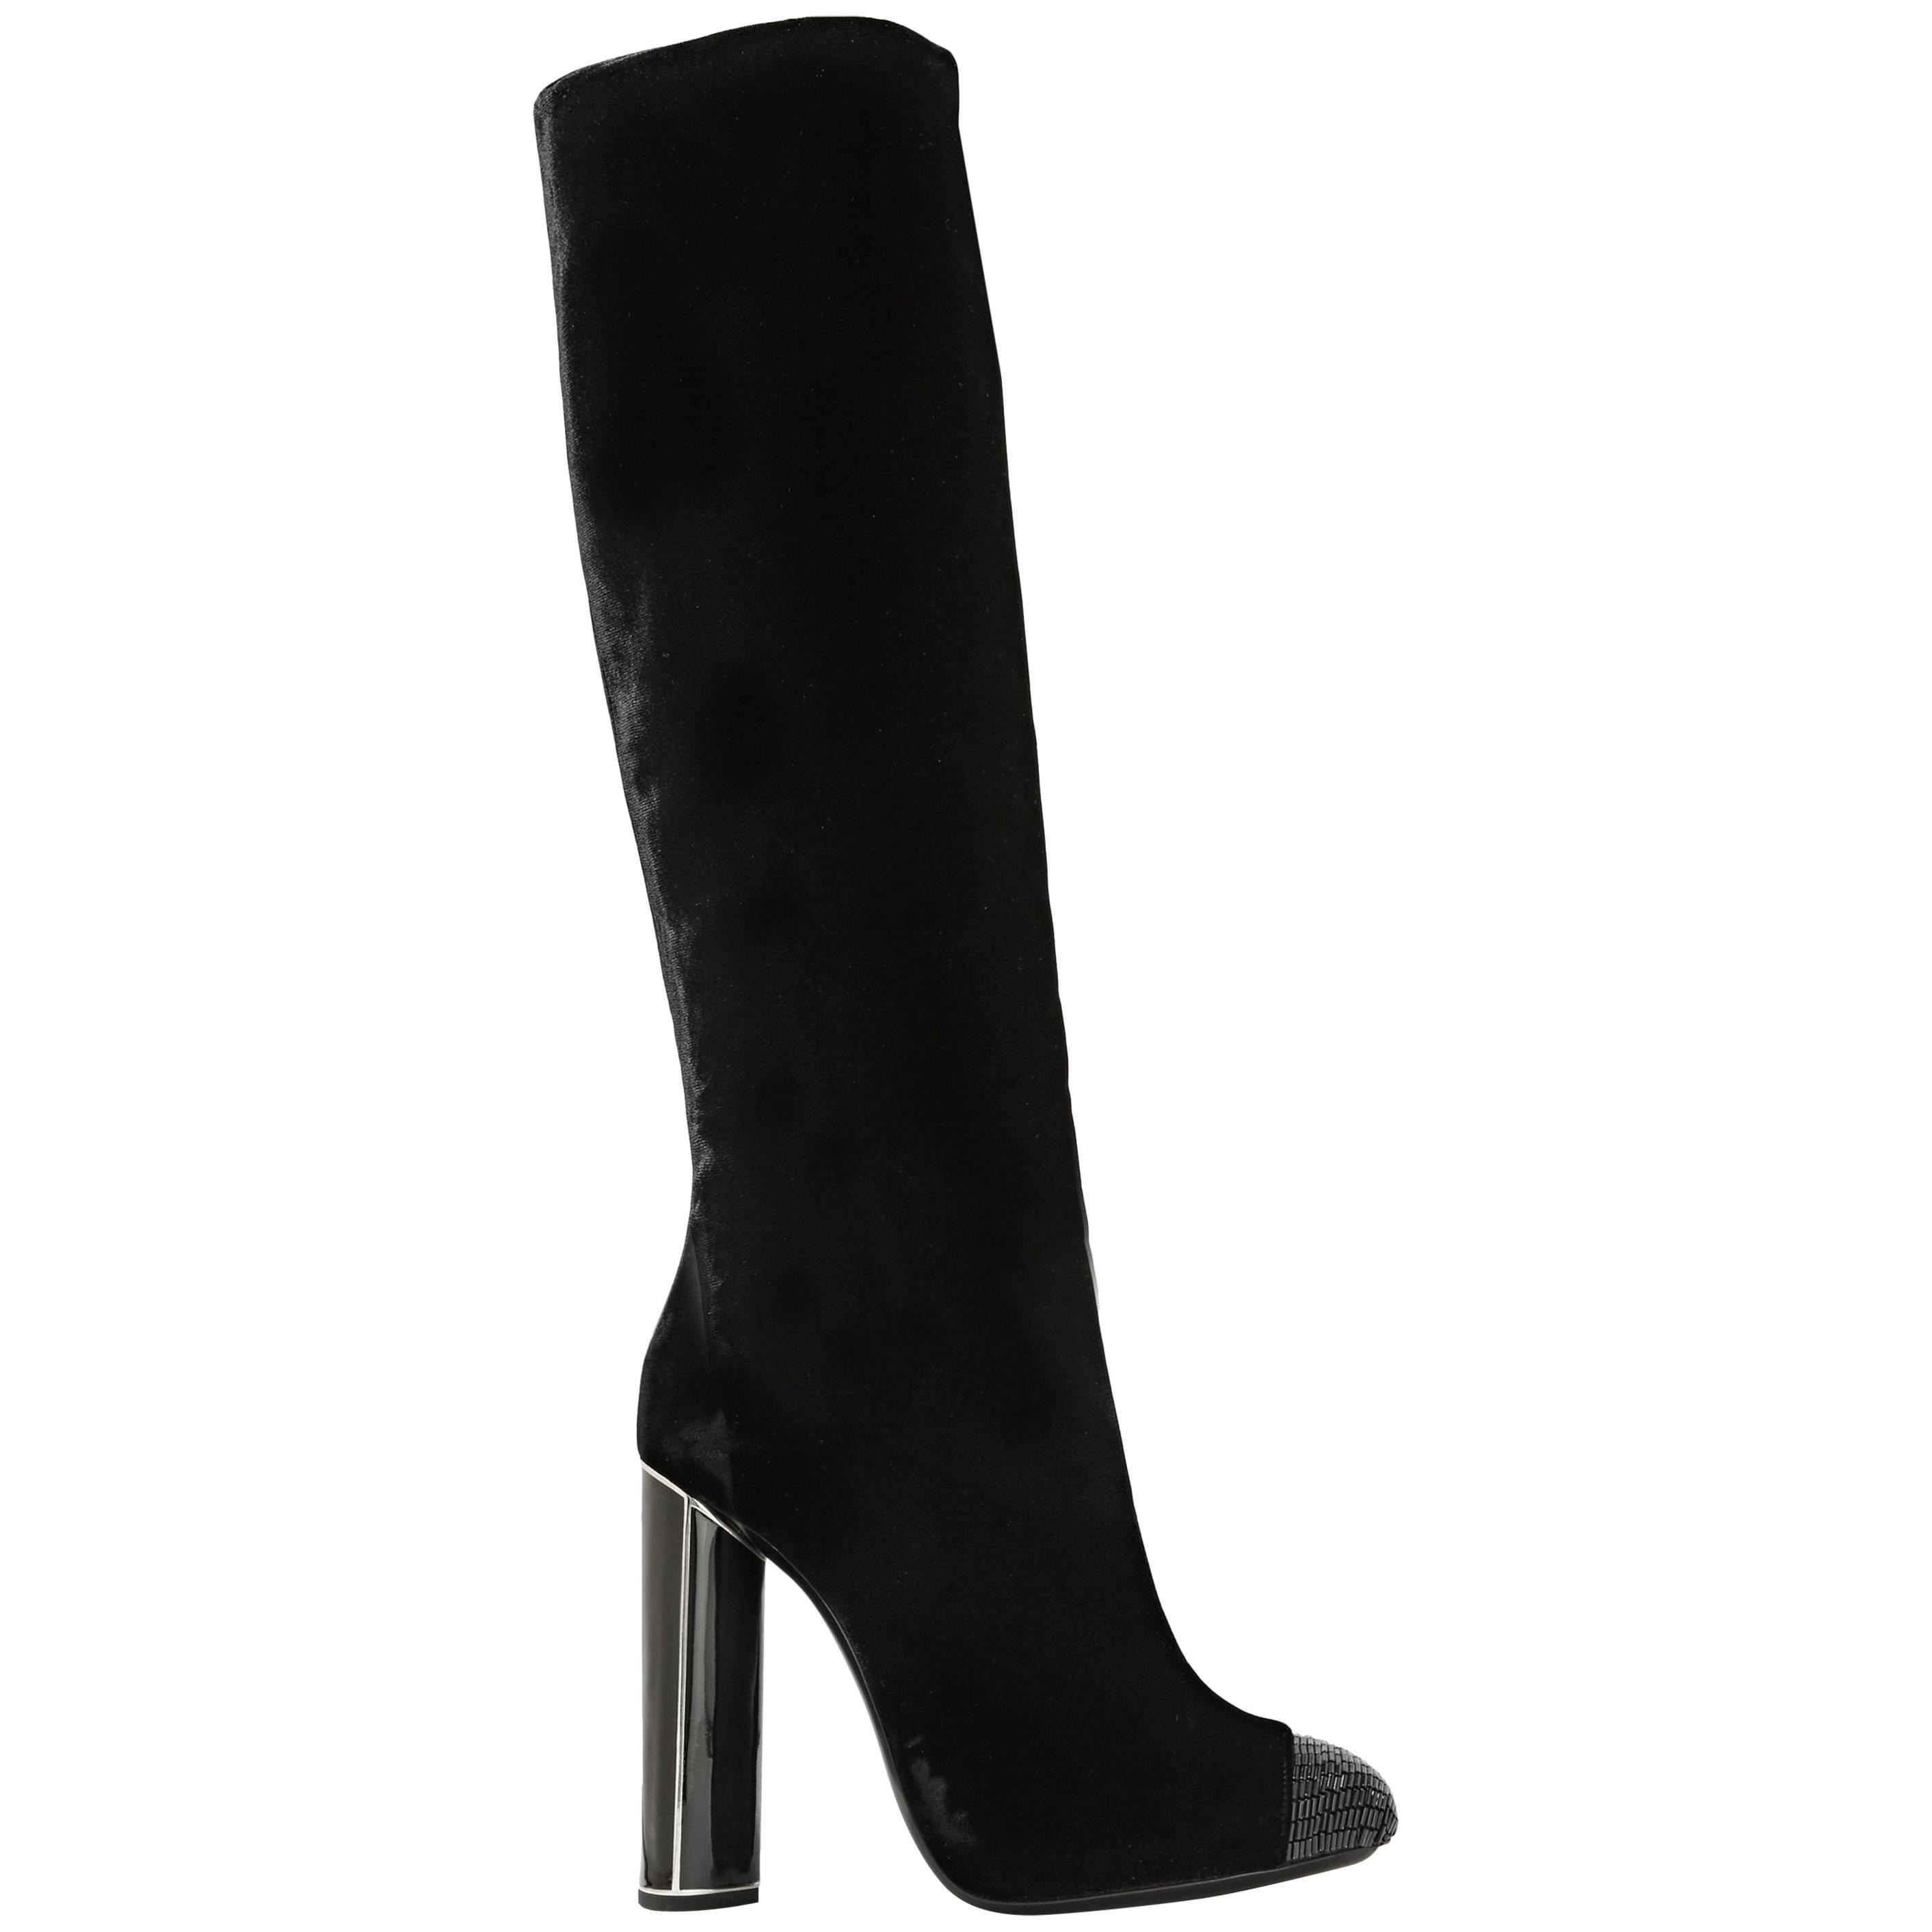 New $2700 Tom Ford Bead-embellished Black Velvet High Heel Boots 38  - 8